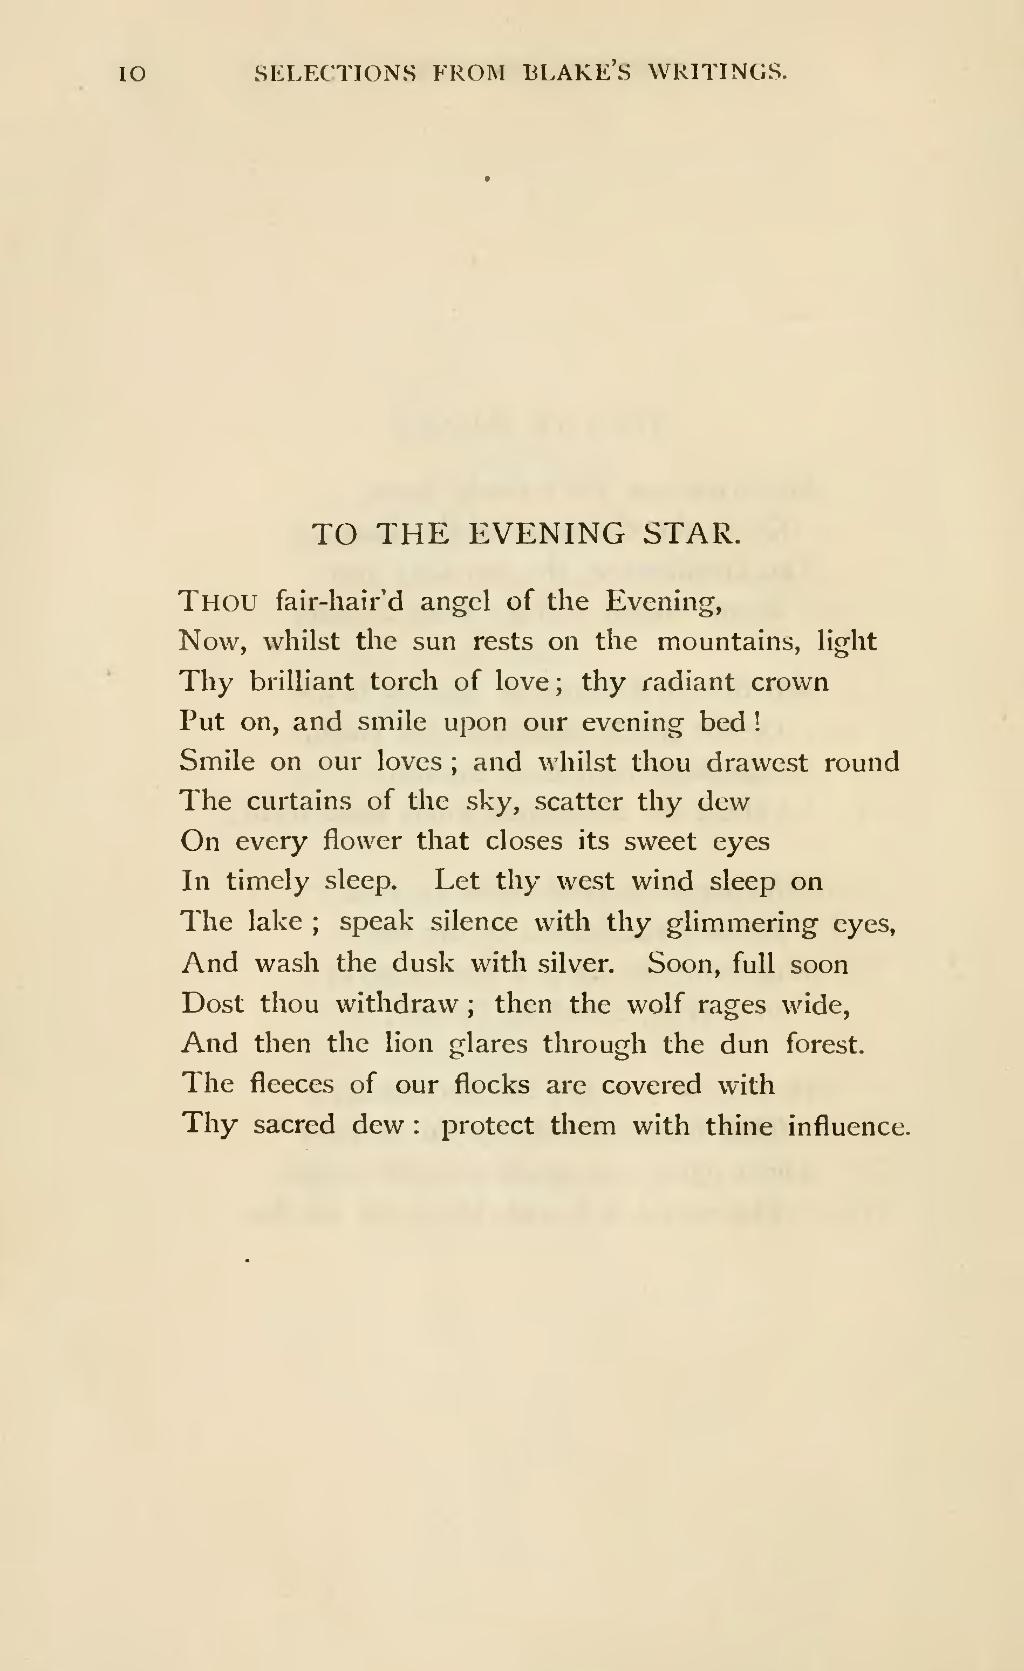 william blake to the evening star